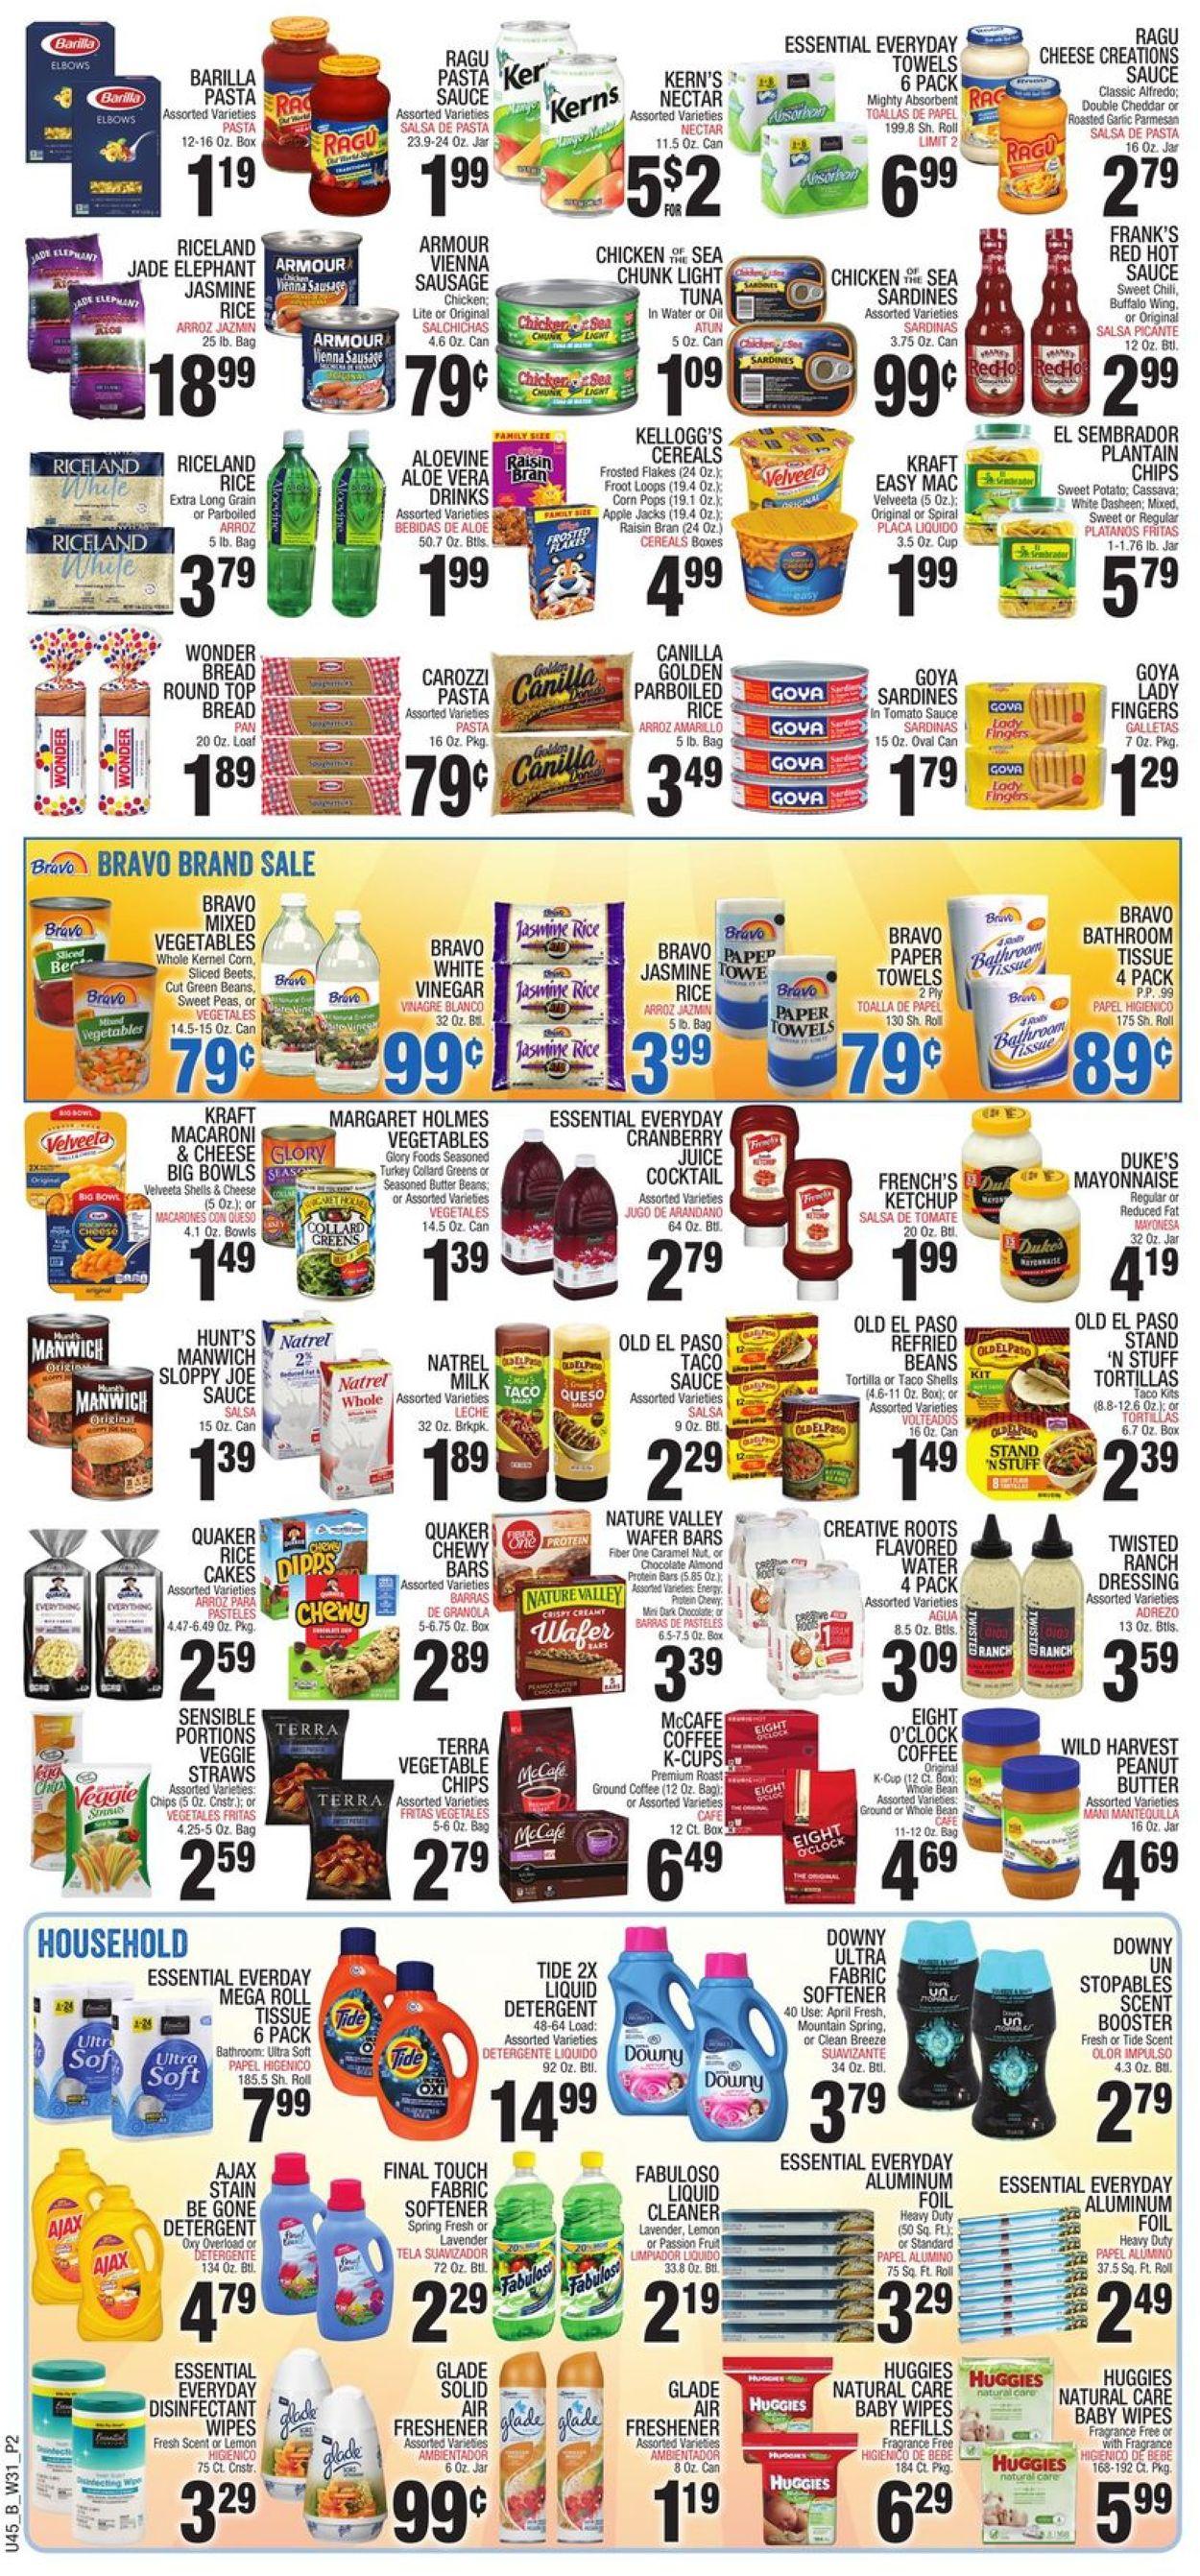 Bravo Supermarkets Weekly Ad Circular - valid 07/29-08/04/2021 (Page 2)